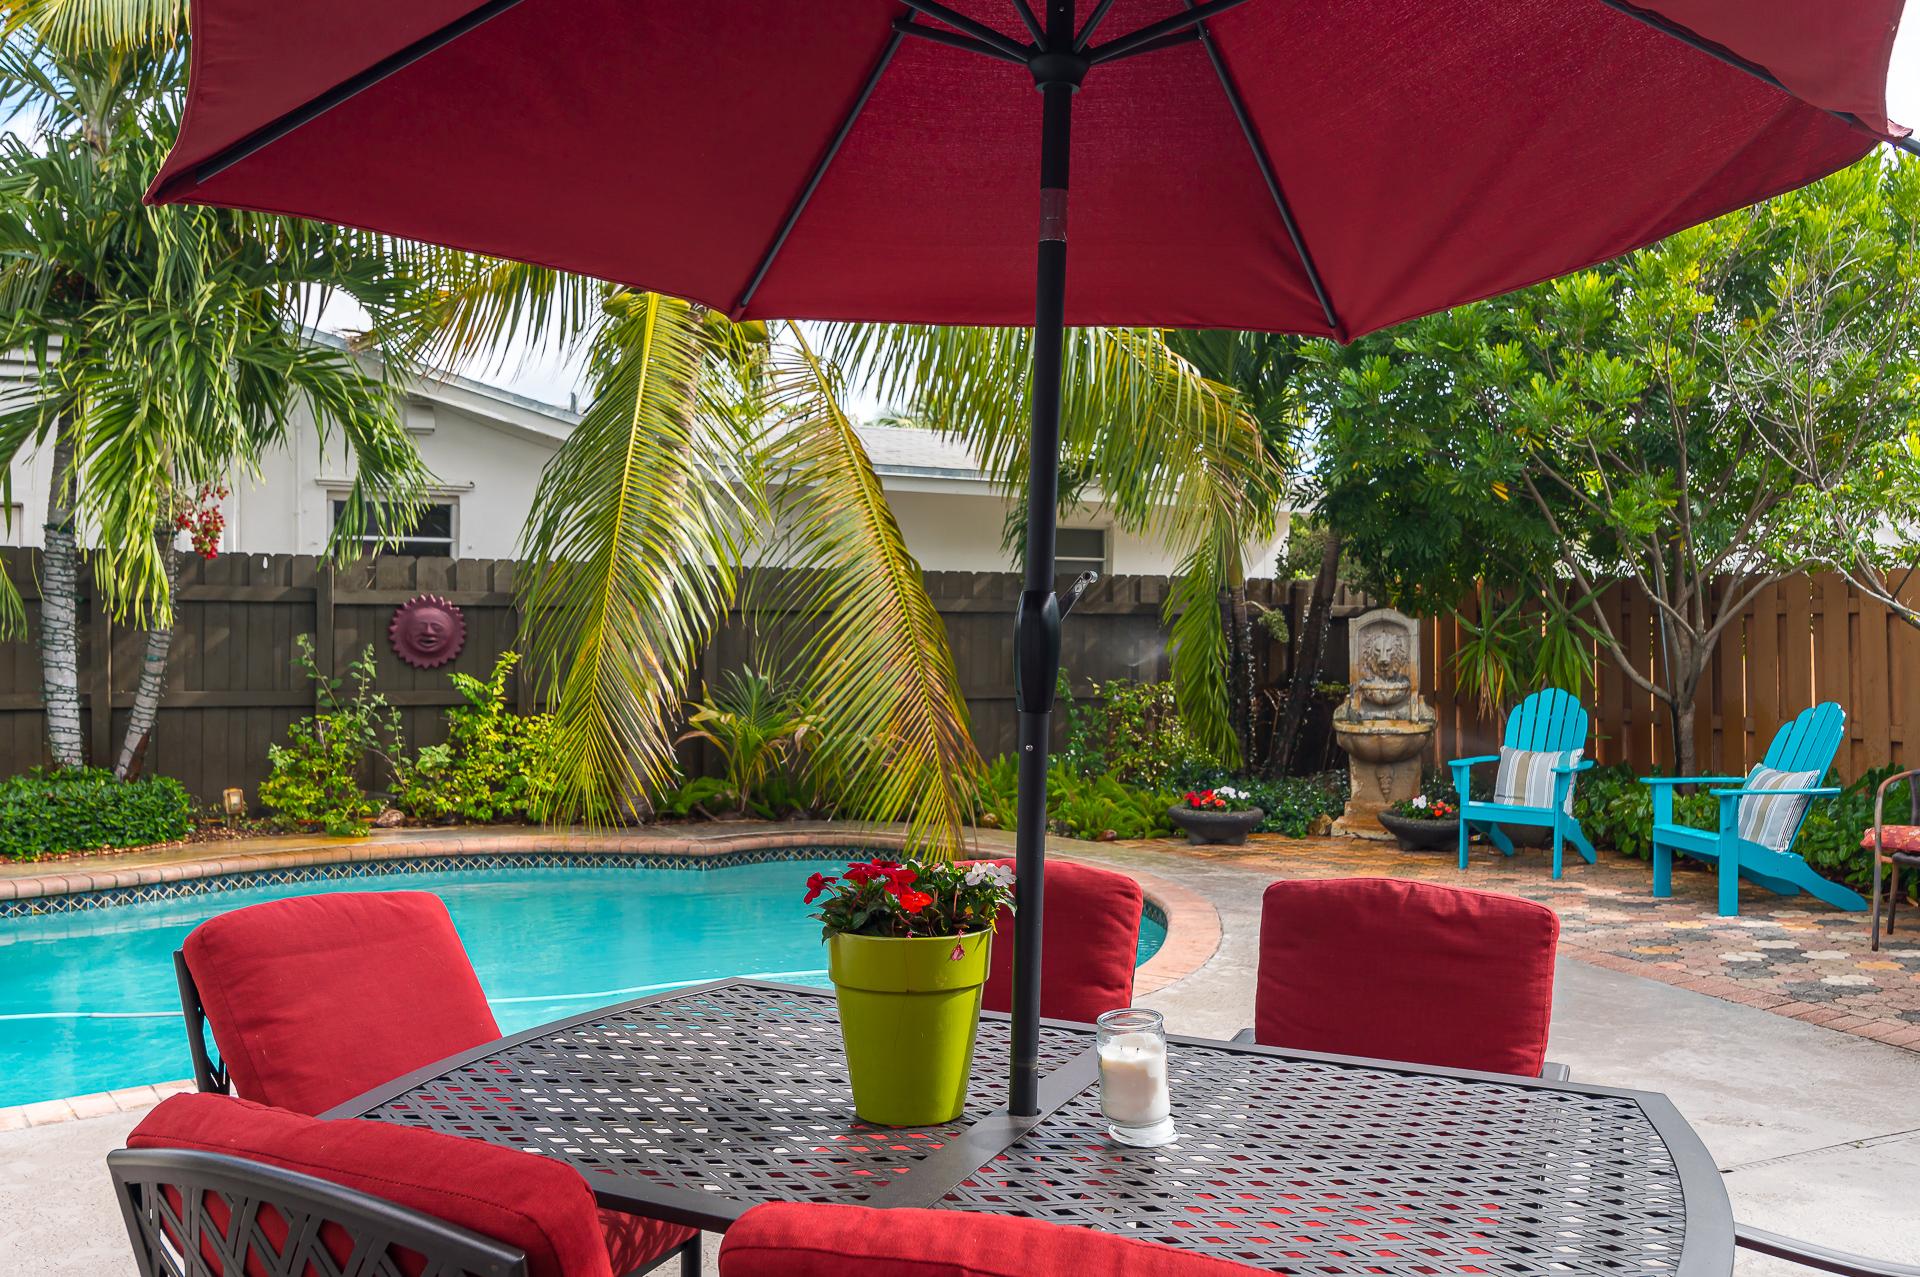 3380-NE-8th-Ave-Fort-Lauderdale-FL-33334